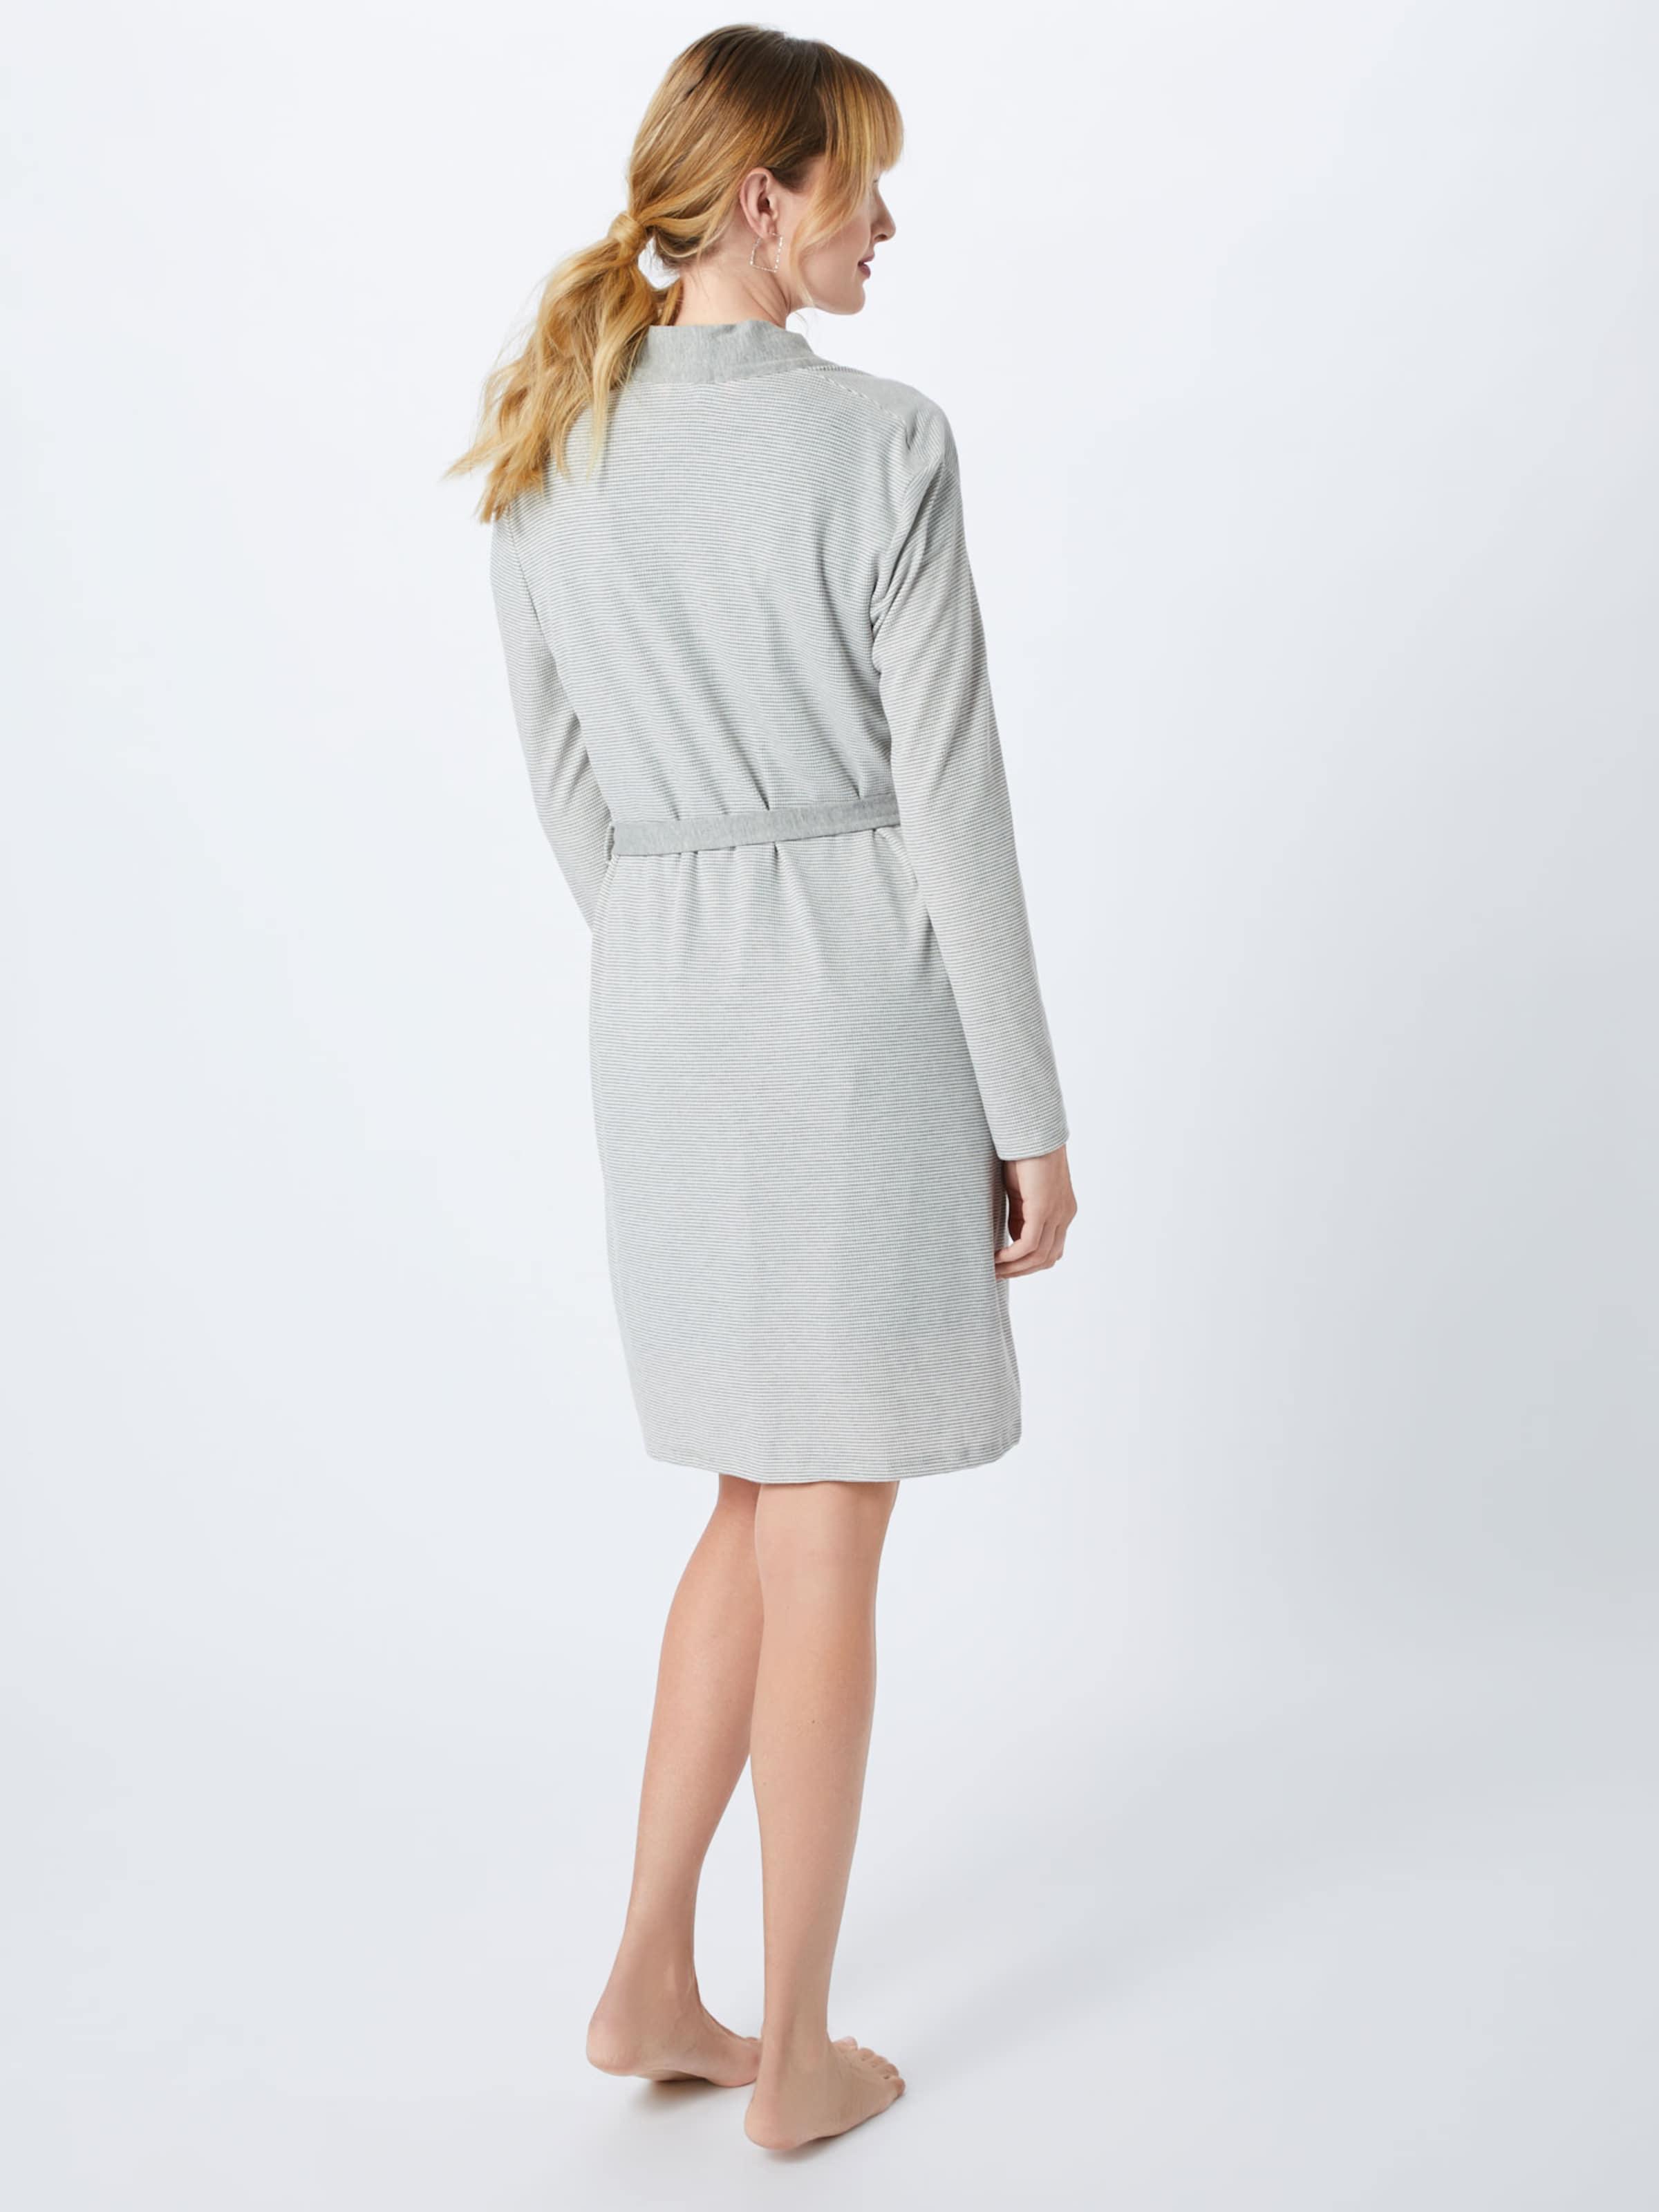 Hunkemöller En Jersey Rib' 'robe Chambre Robe Gris De jVLqMGpUSz